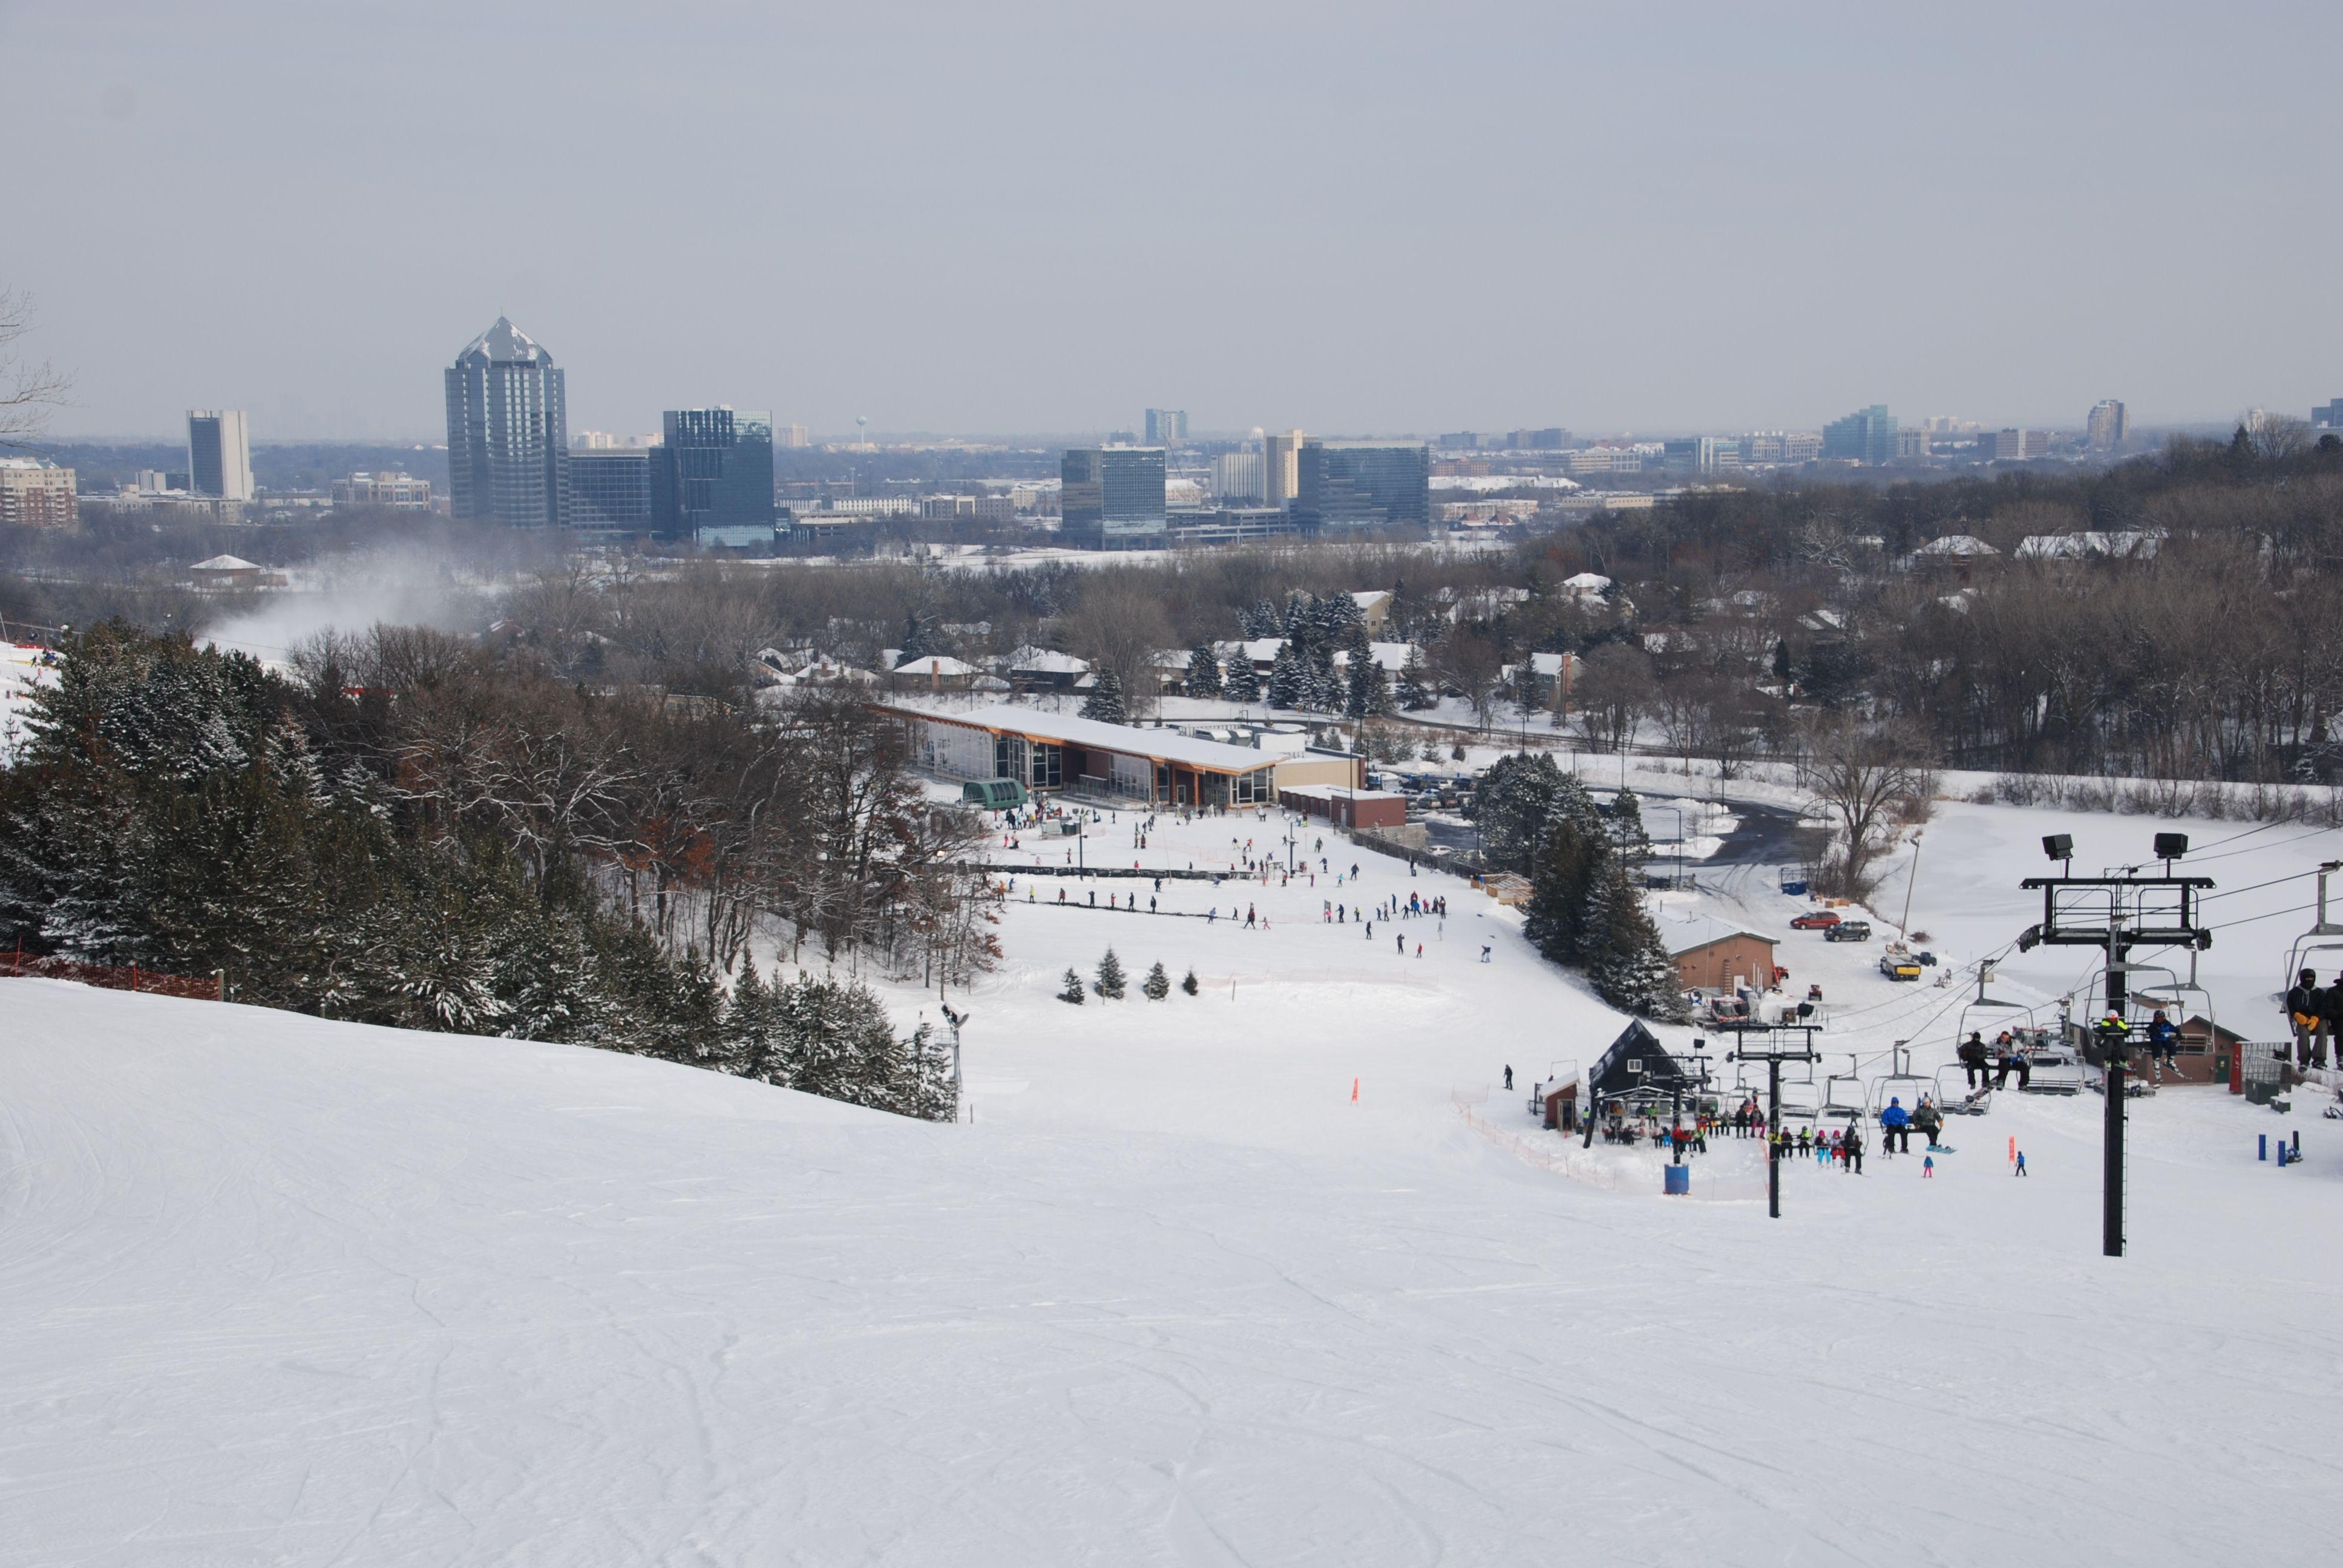 Perfect time of the year to visit Hyland Hills Ski Area!  #BloomingtonMN #skiing #familyfun